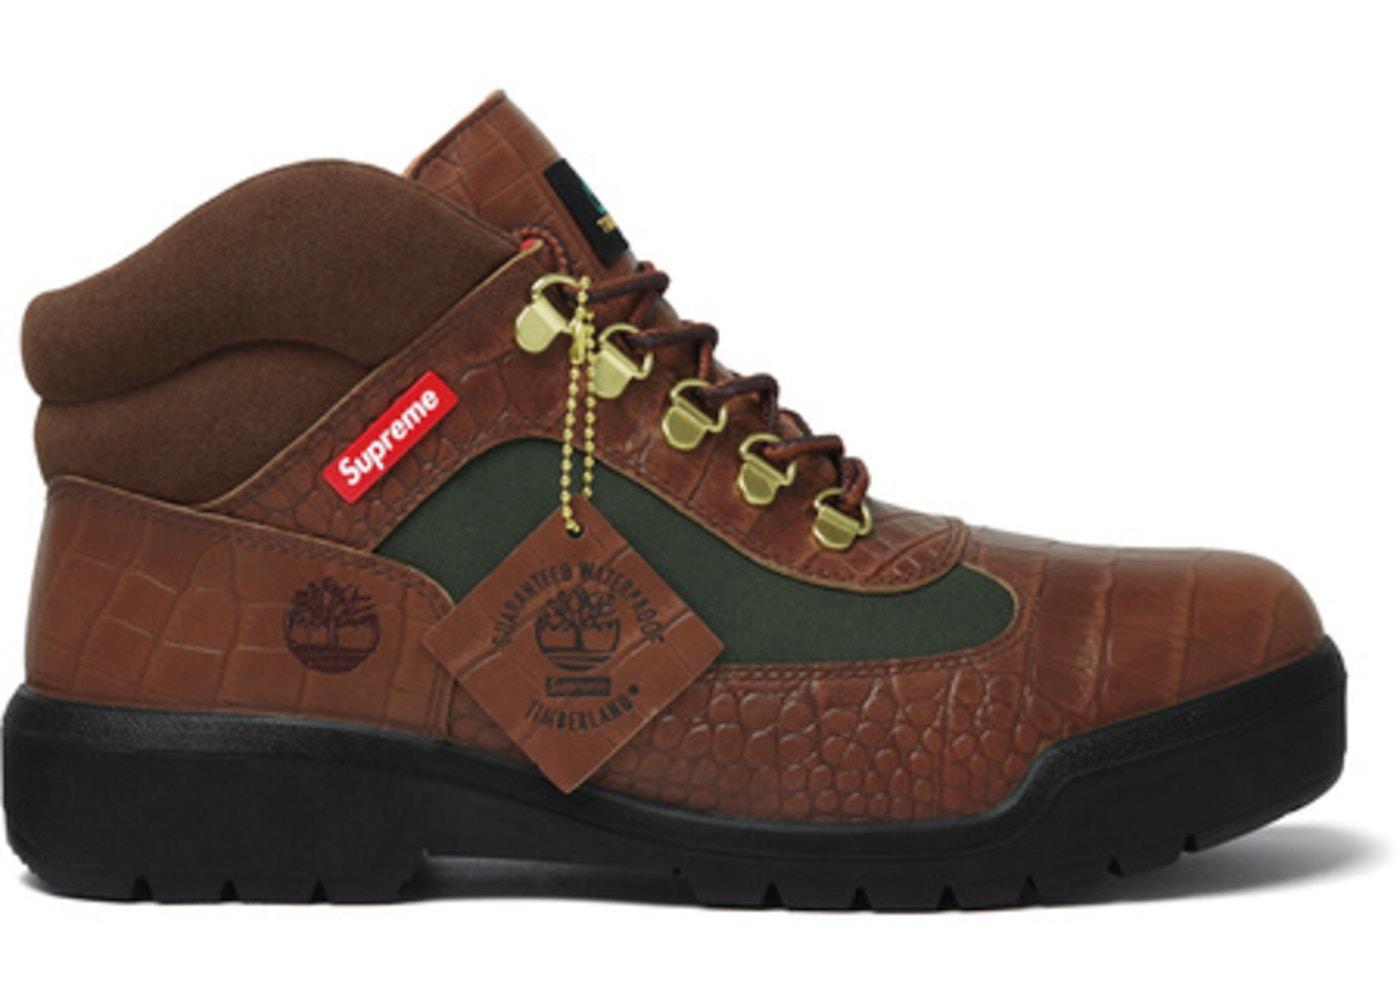 Supreme x Timberland Field Boot | Highsnobiety